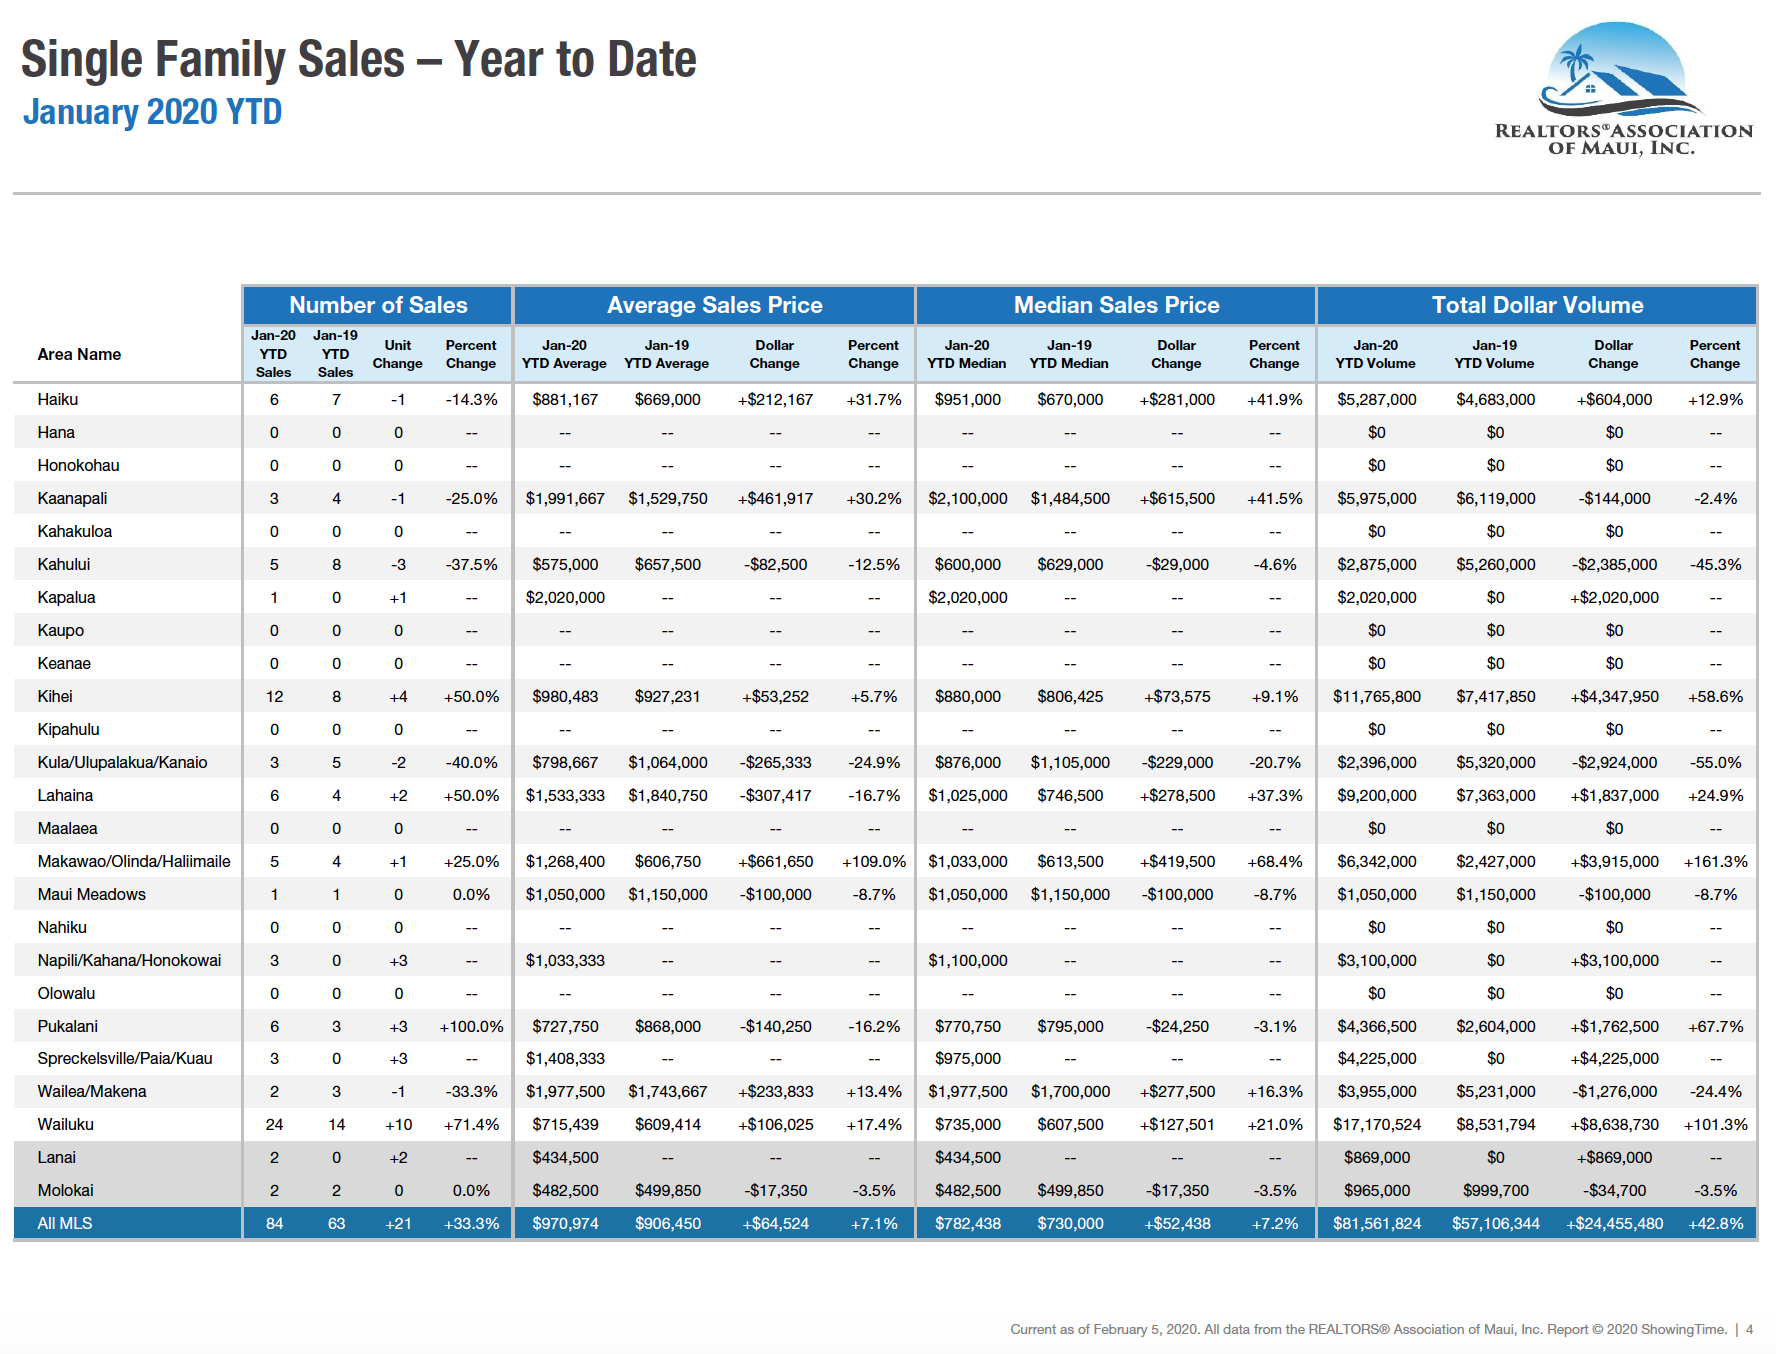 Maui single family home sale statistics for 2020.